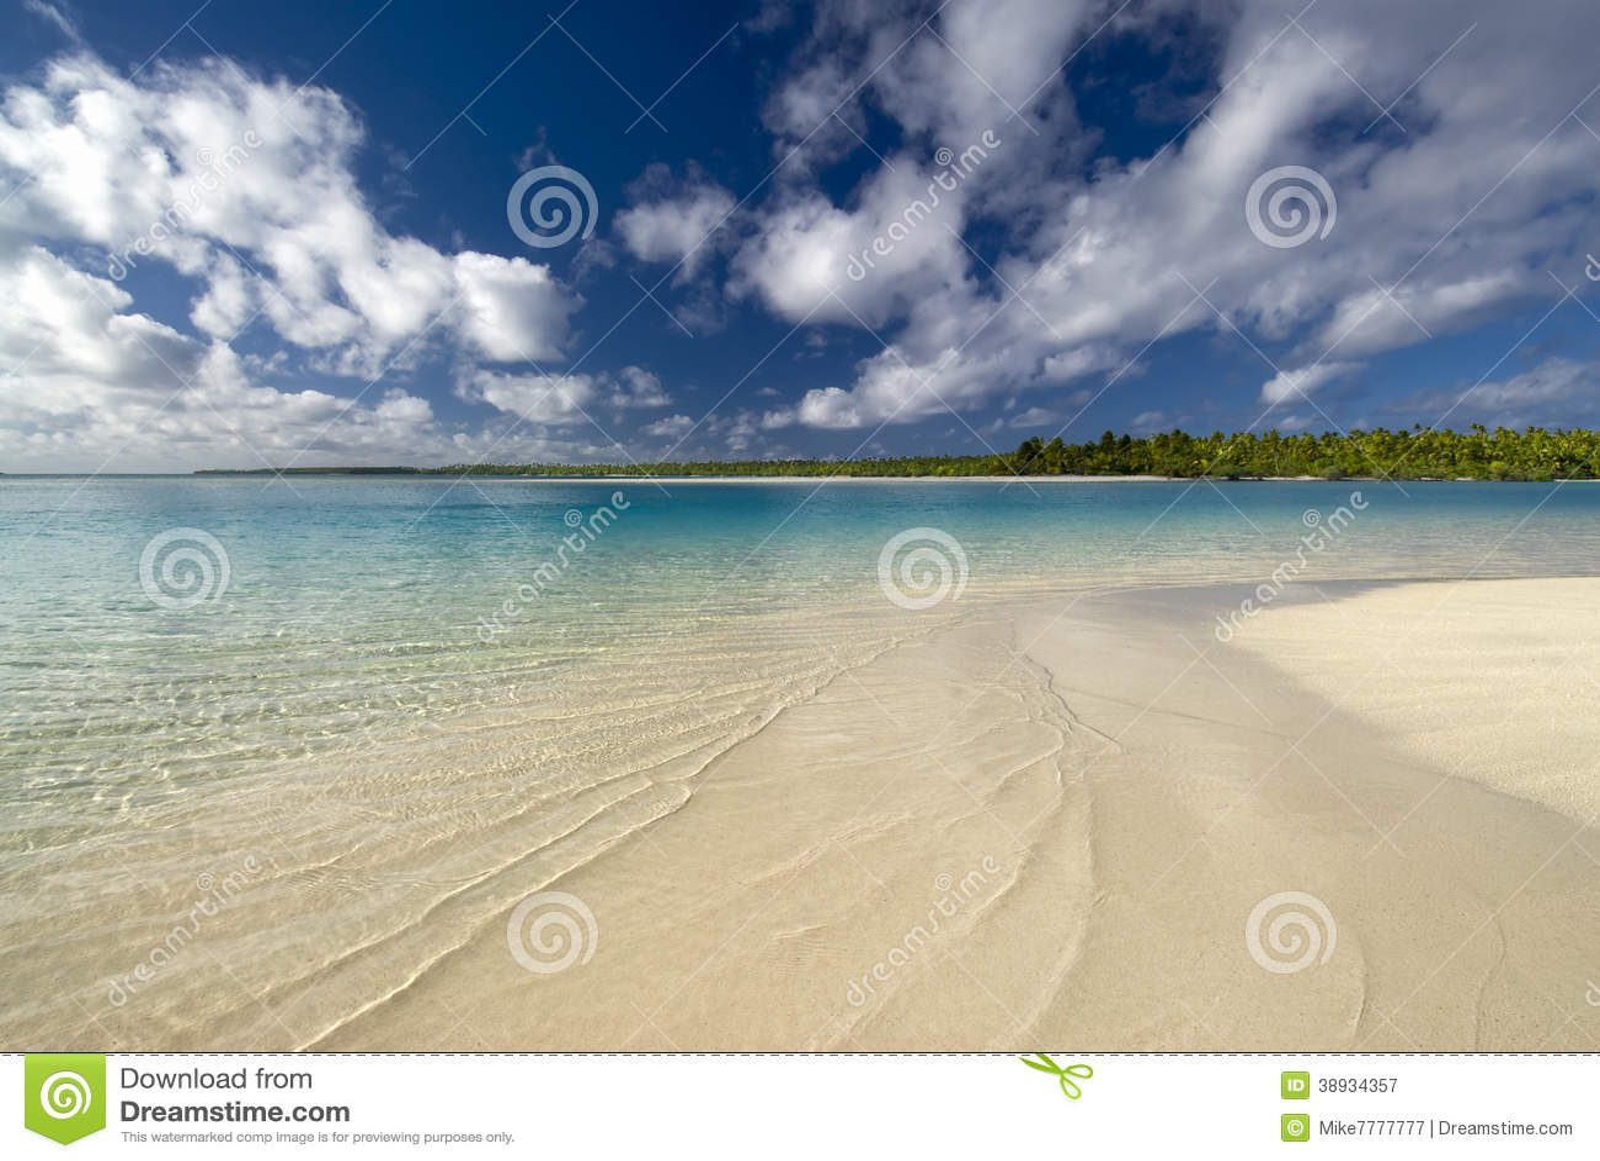 Lagoon Tropical Island: Tropical Beach And Lagoon. Aitutaki,Cook Islands Stock